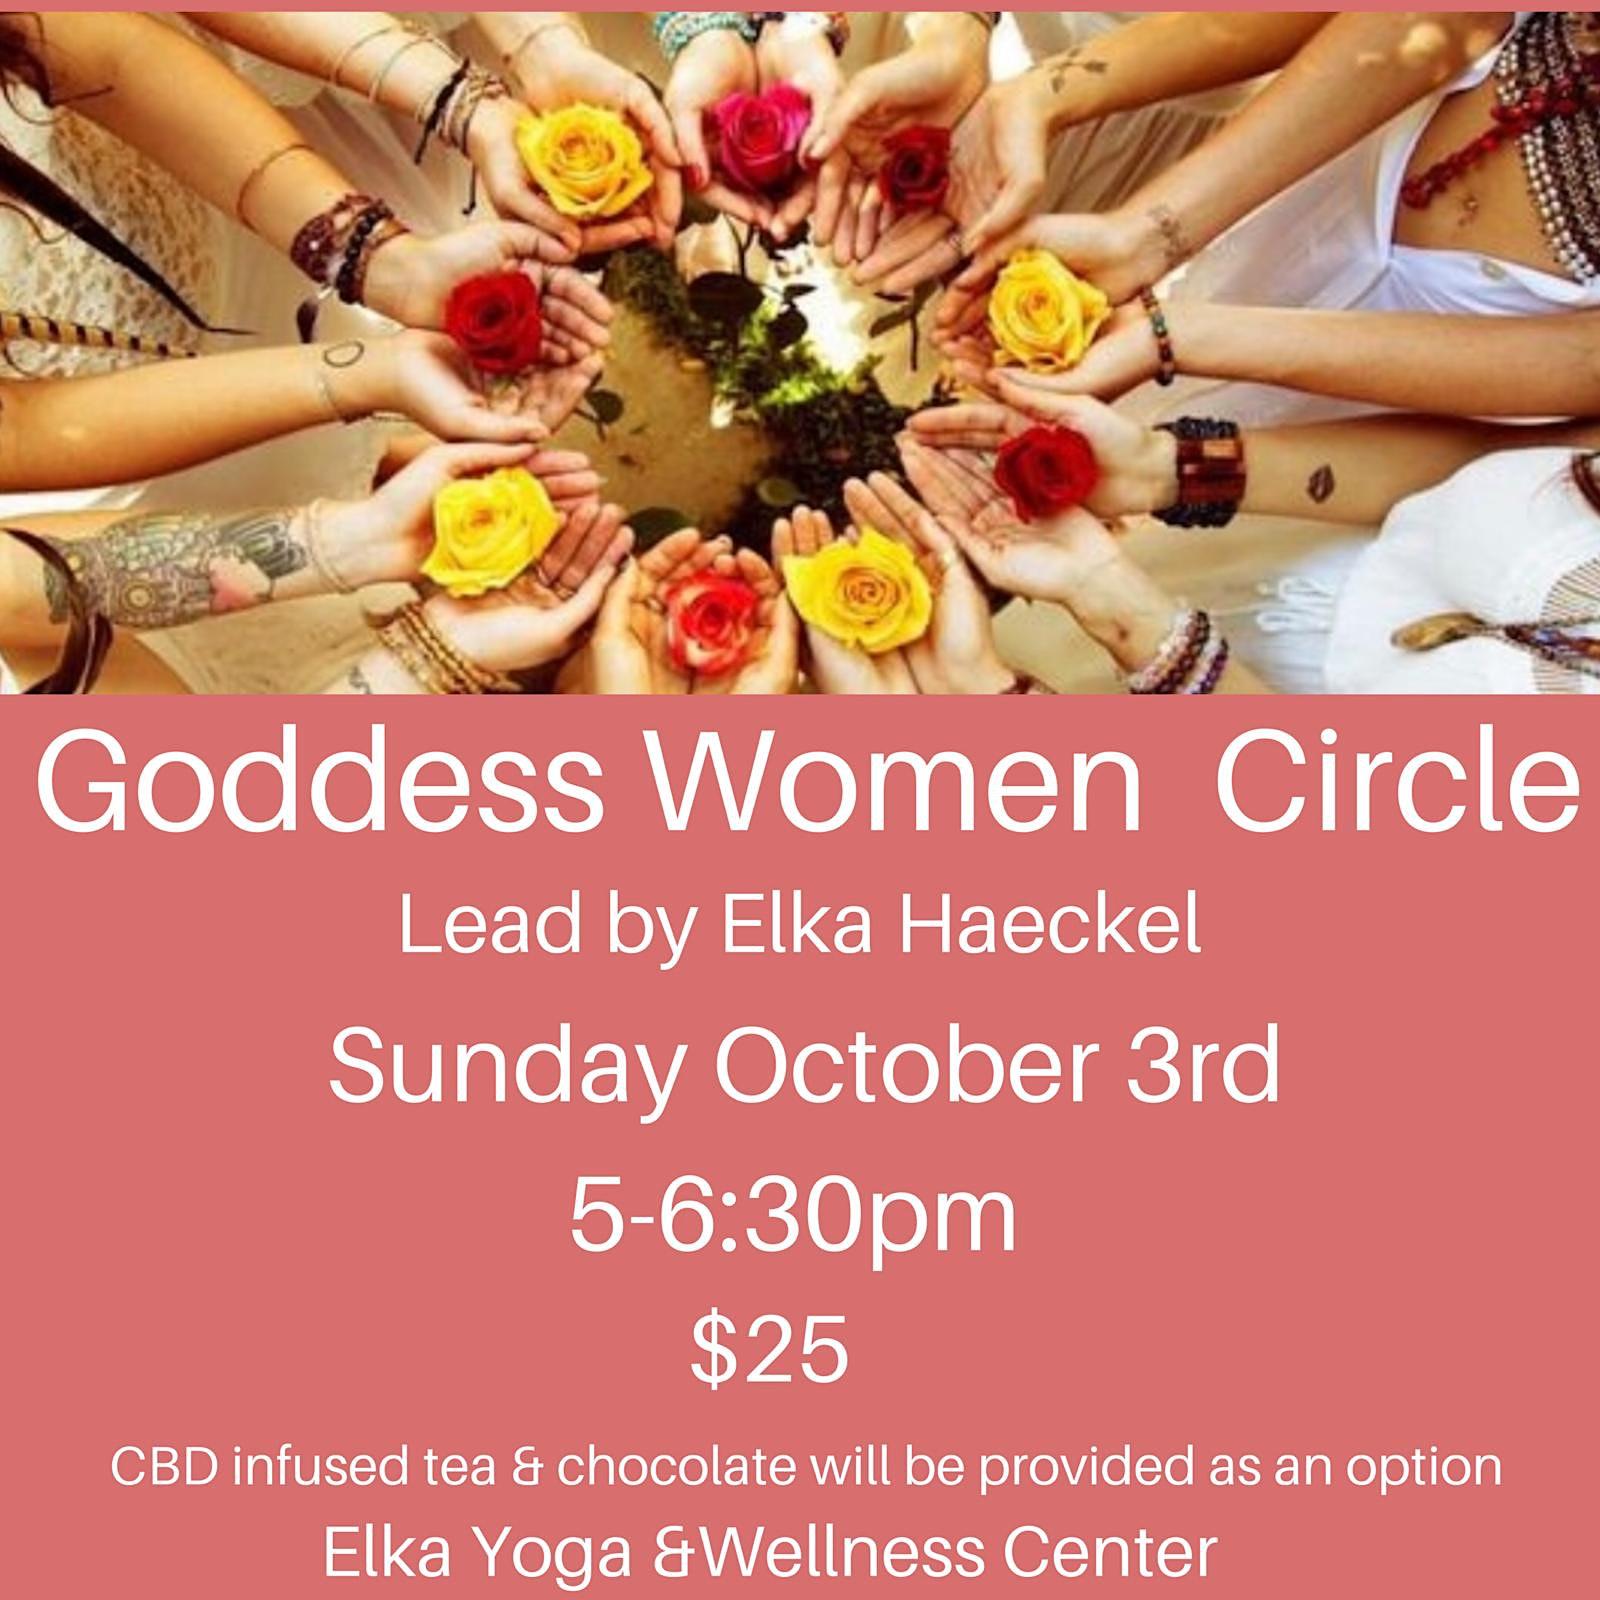 Goddess Women Circle